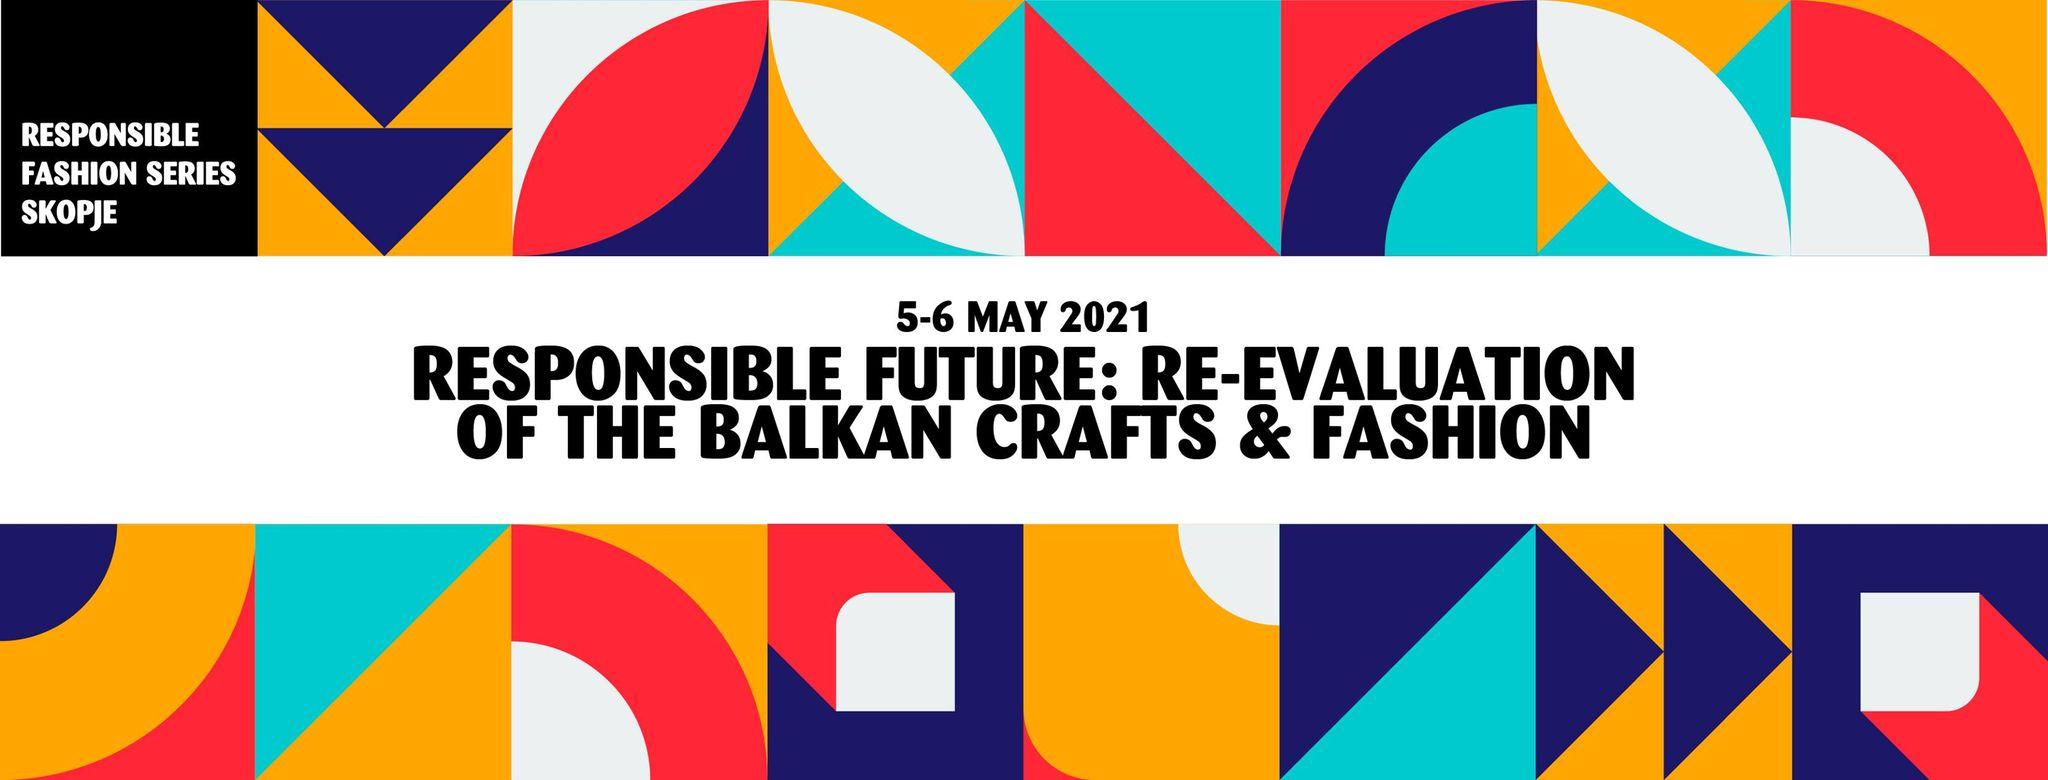 Responsible Fashion Series Skopje, online, 5-6 May 2021